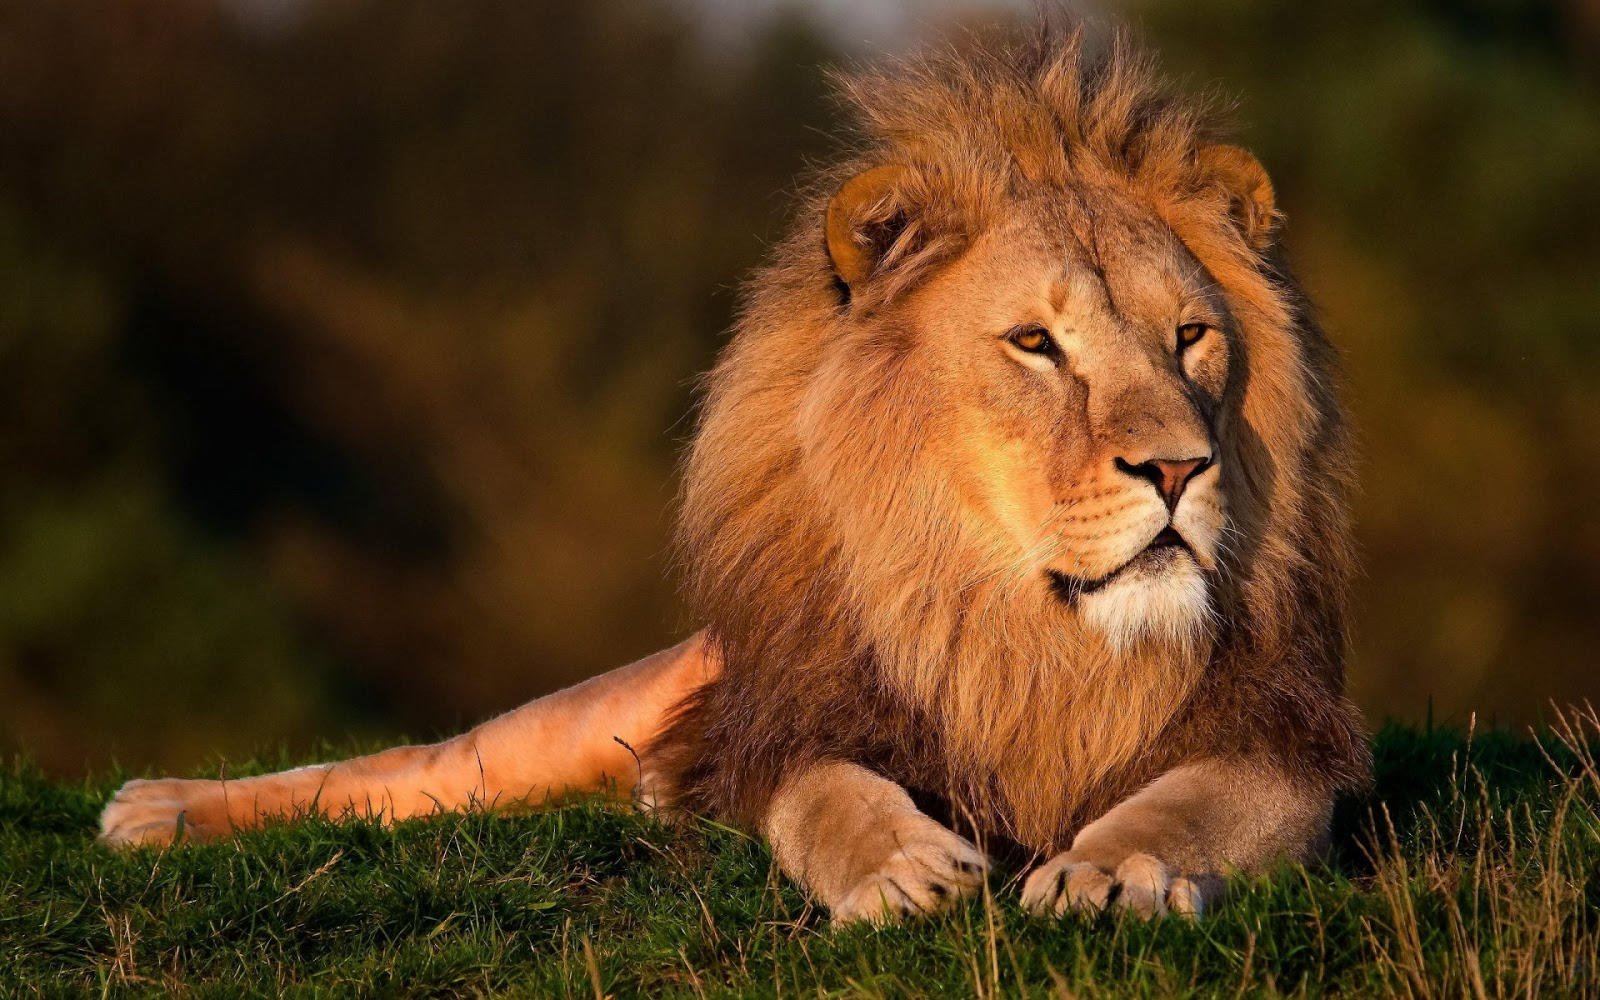 Lion Male Chilling   Full HD Desktop Wallpapers 1080p